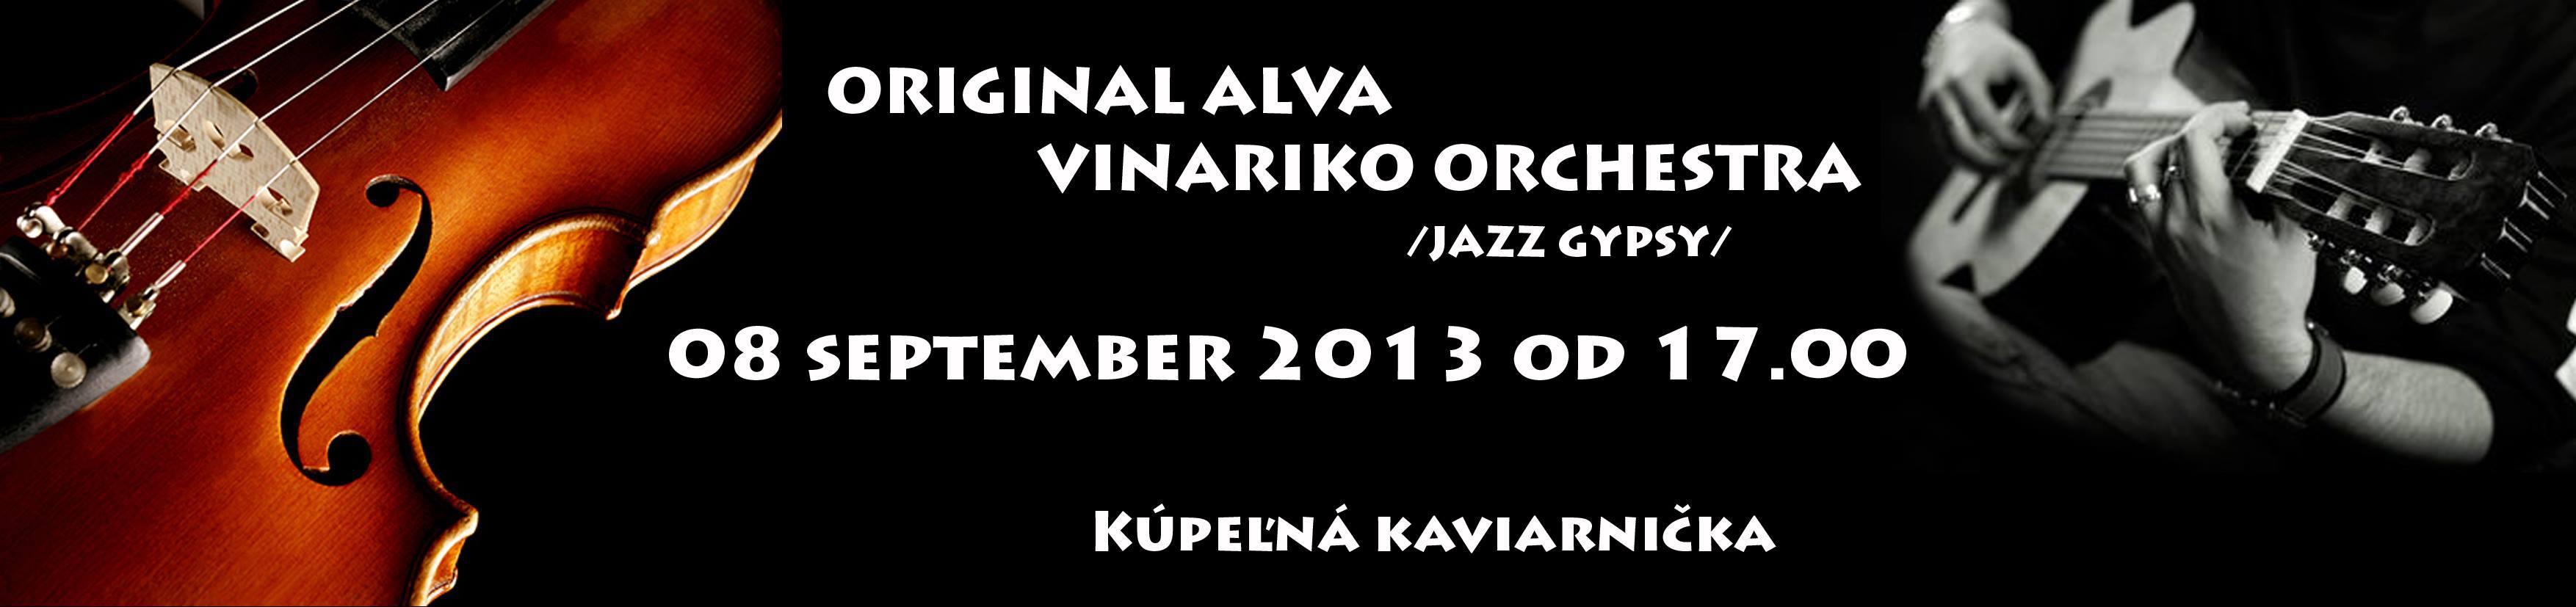 Essential Gipsy jazz by Original Alva Vinariko Orchestra